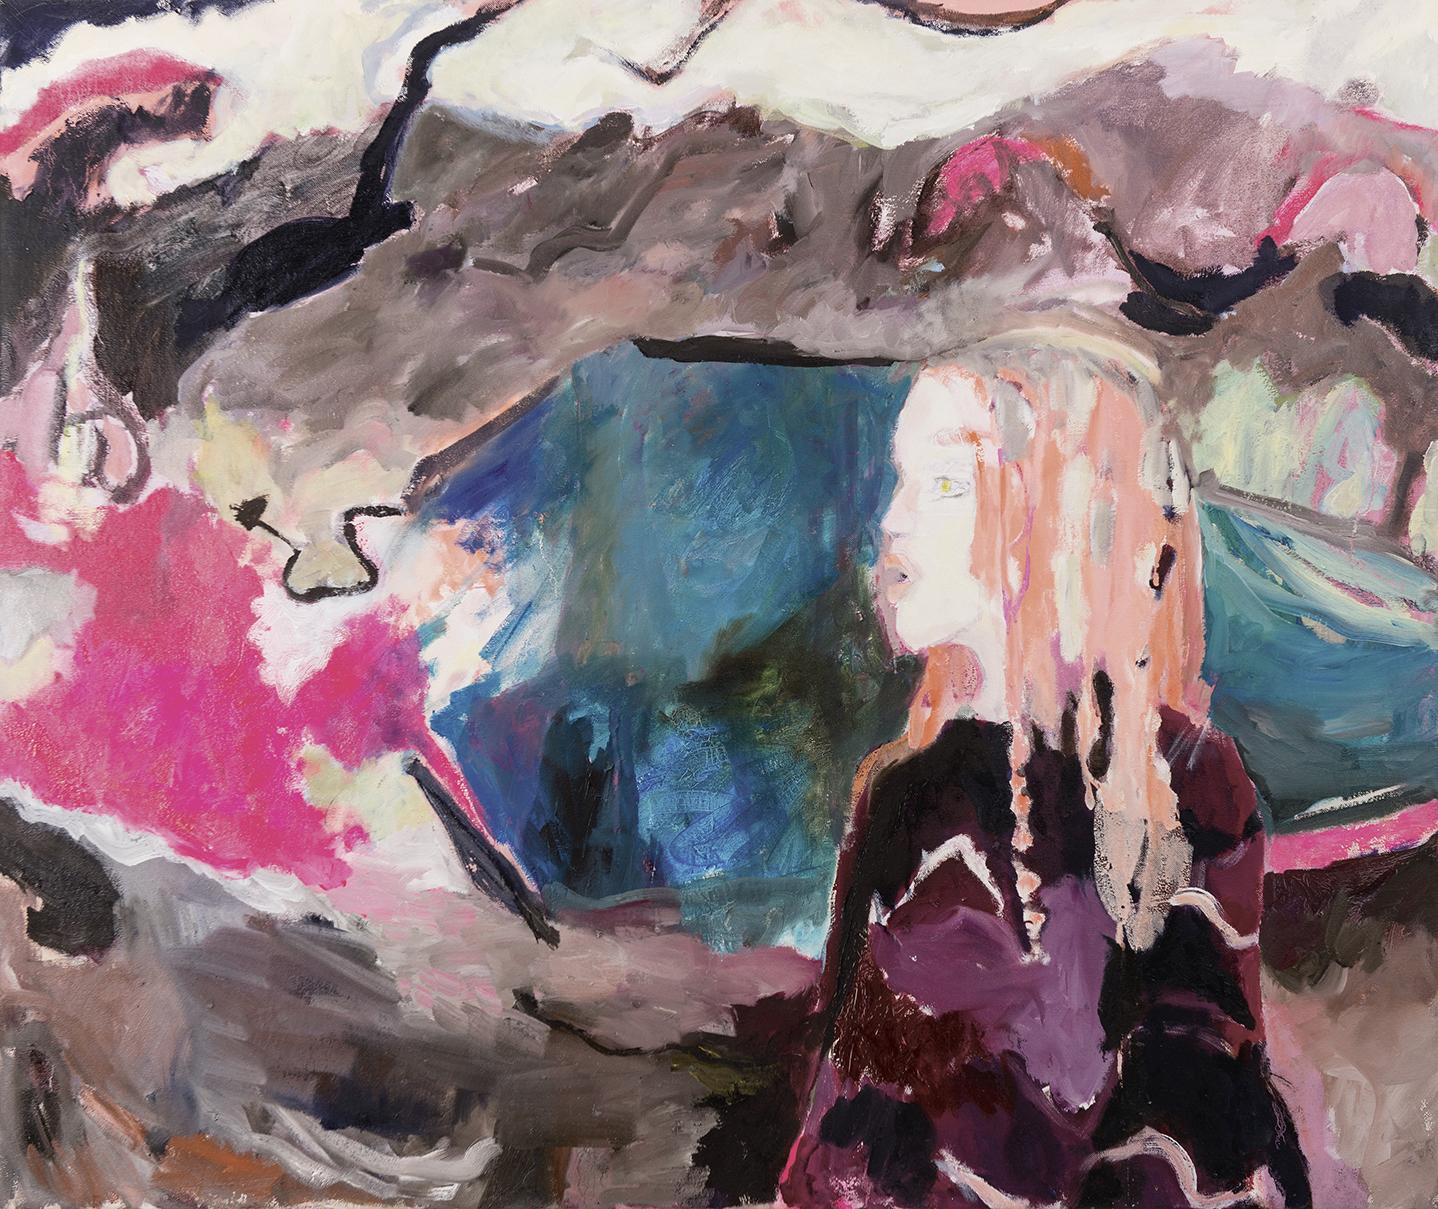 Lakeside oil on canvas 118×106 cm, 2017